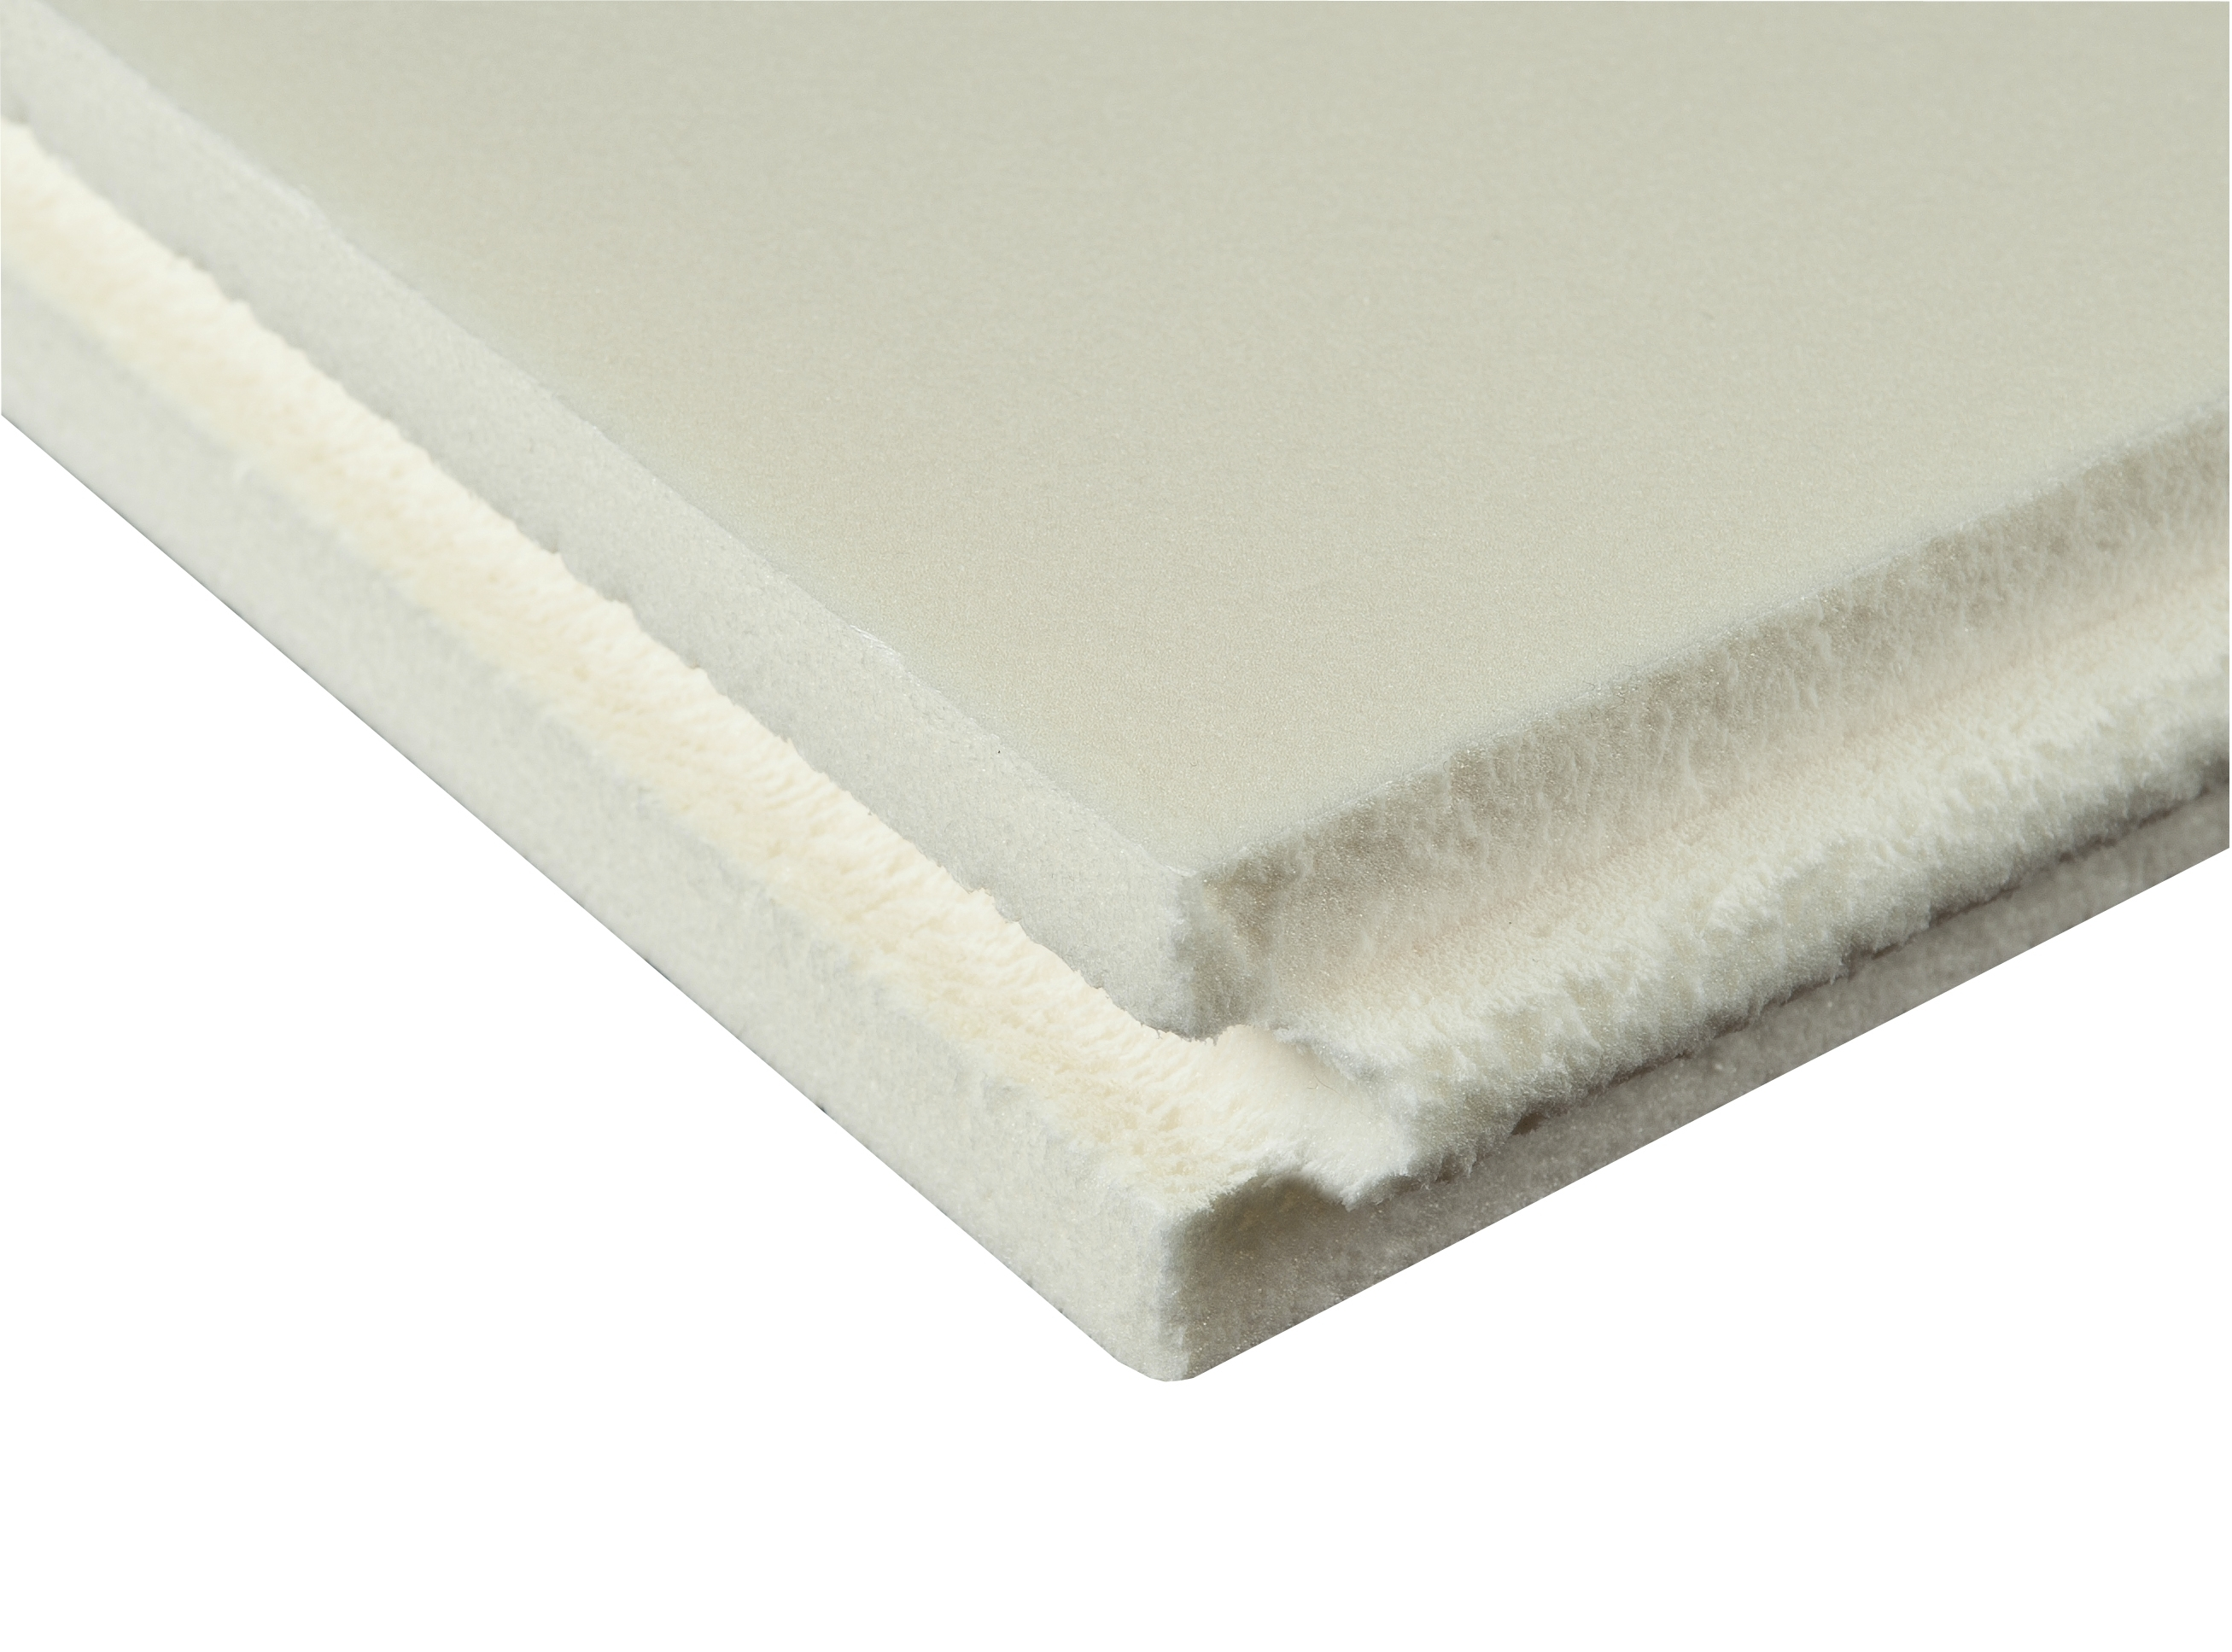 panneau d 39 isolation polystyr ne extrud 5x60x120 cm r l rd 1 45 polystyr ne isolation. Black Bedroom Furniture Sets. Home Design Ideas